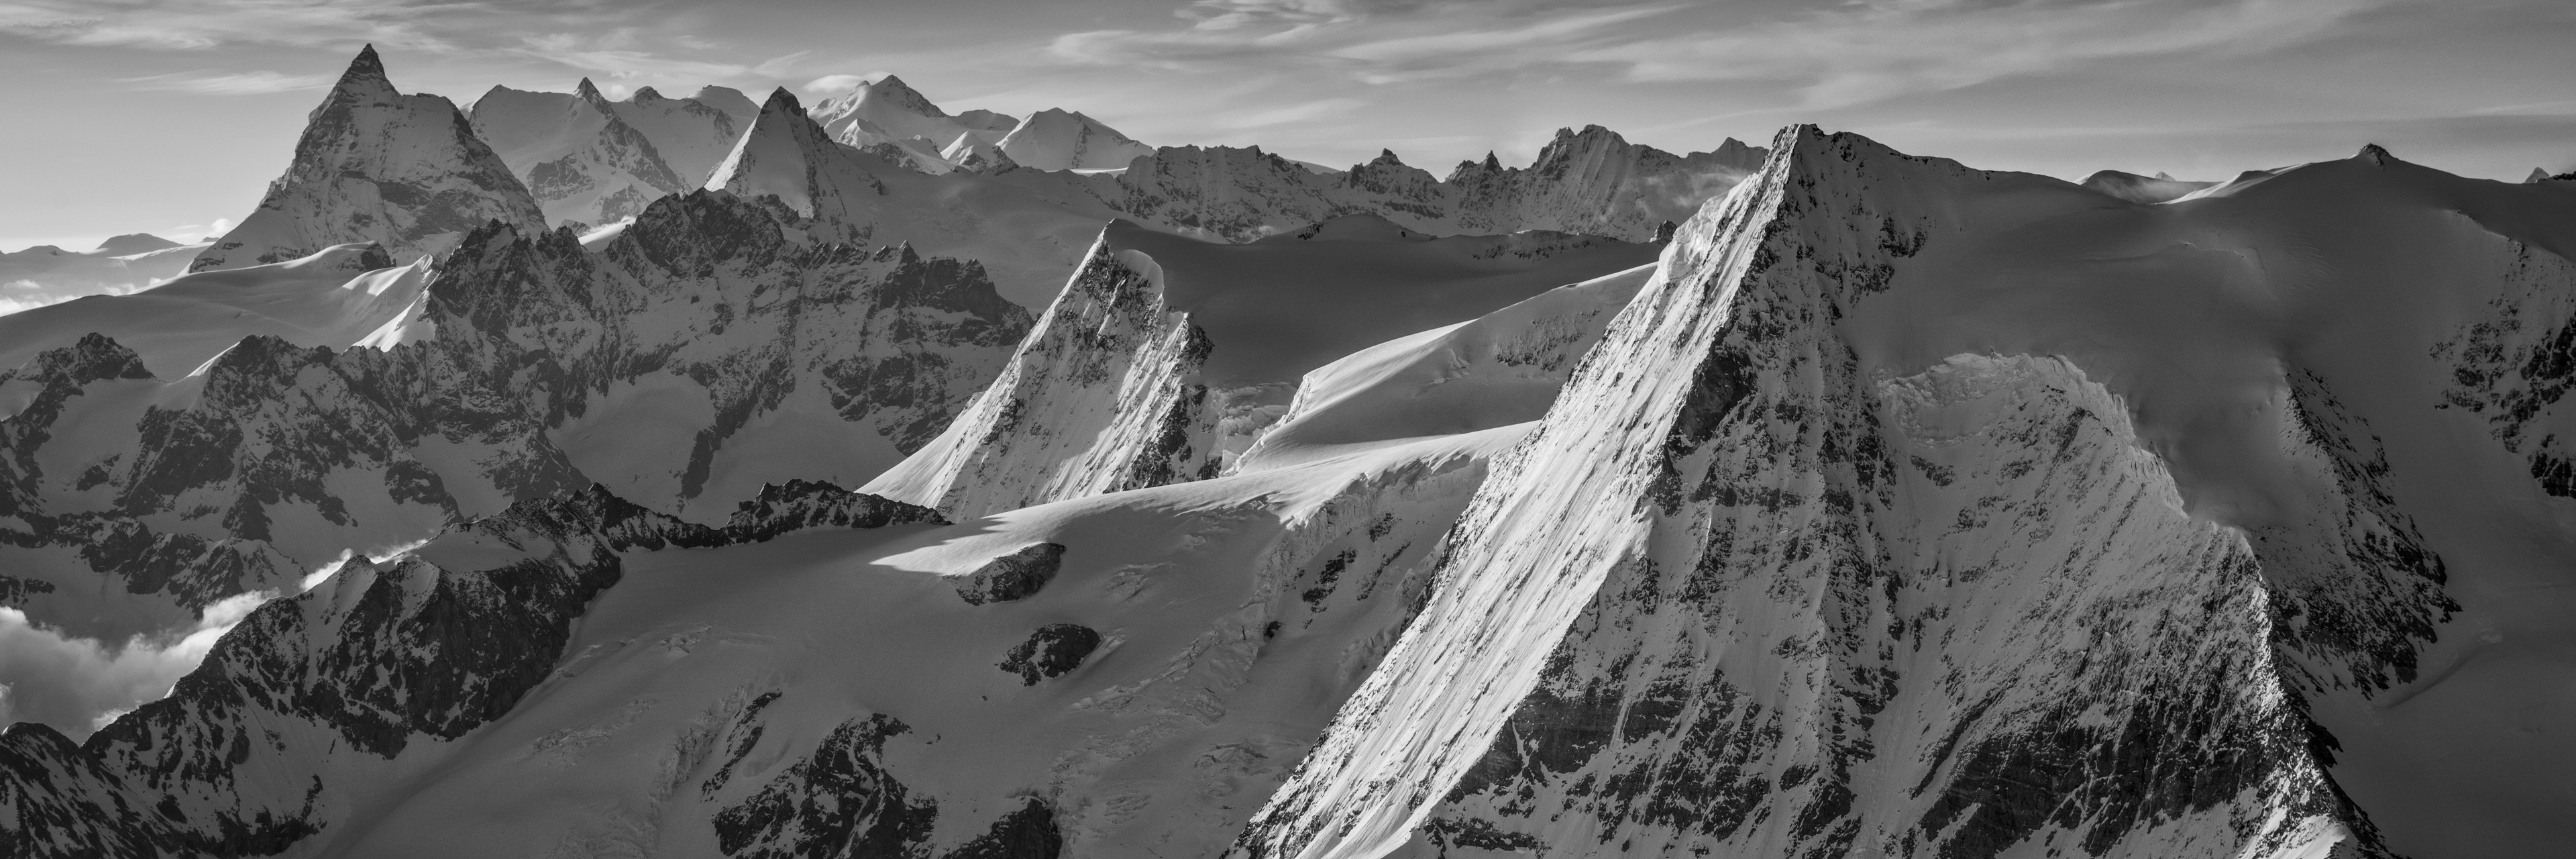 Photos panorama Alpes Suisses Valais - photo panorama mont blanc